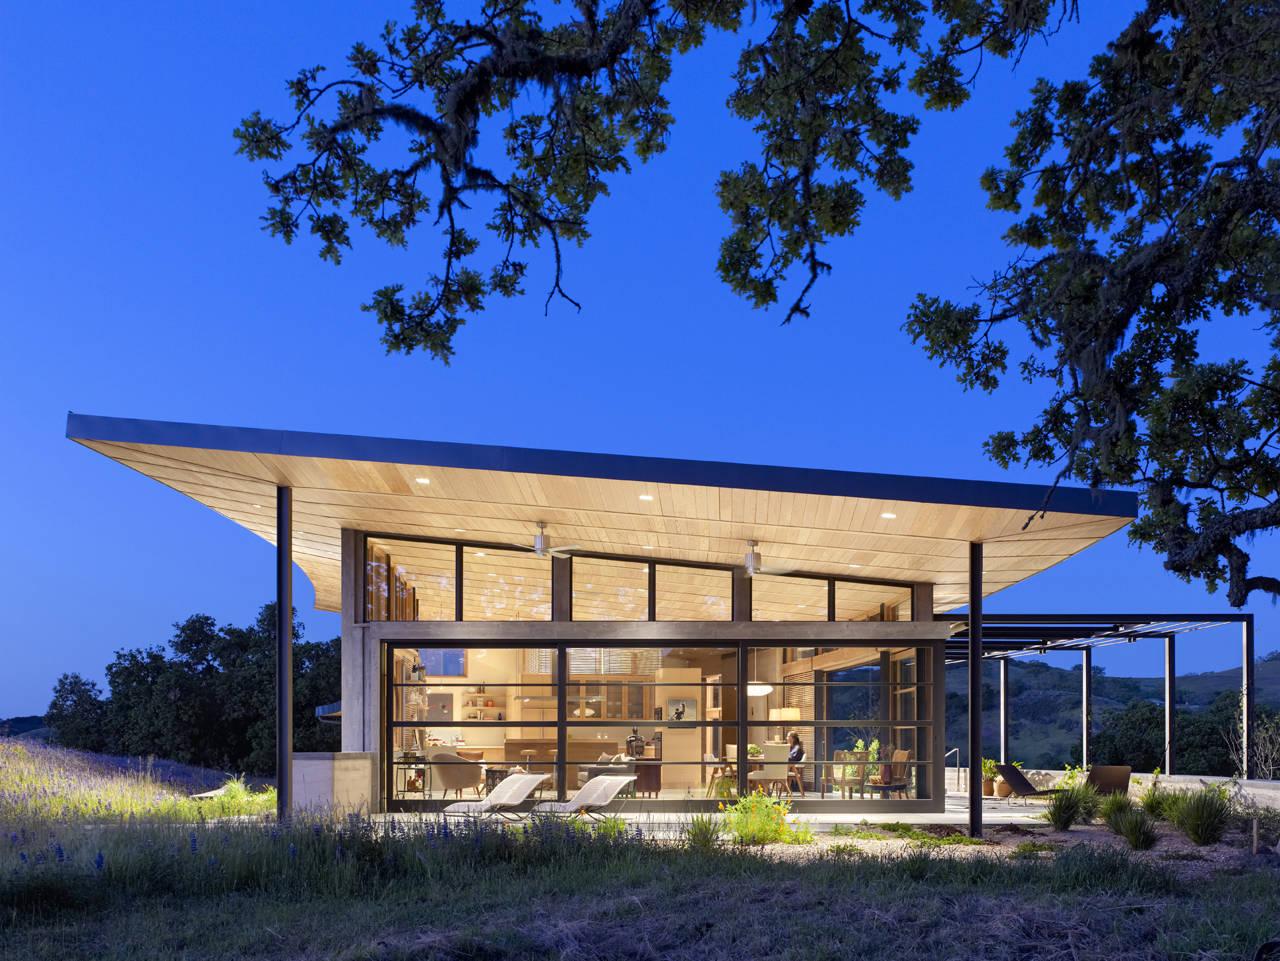 Gallery of Caterpillar House / Feldman Architecture - 2